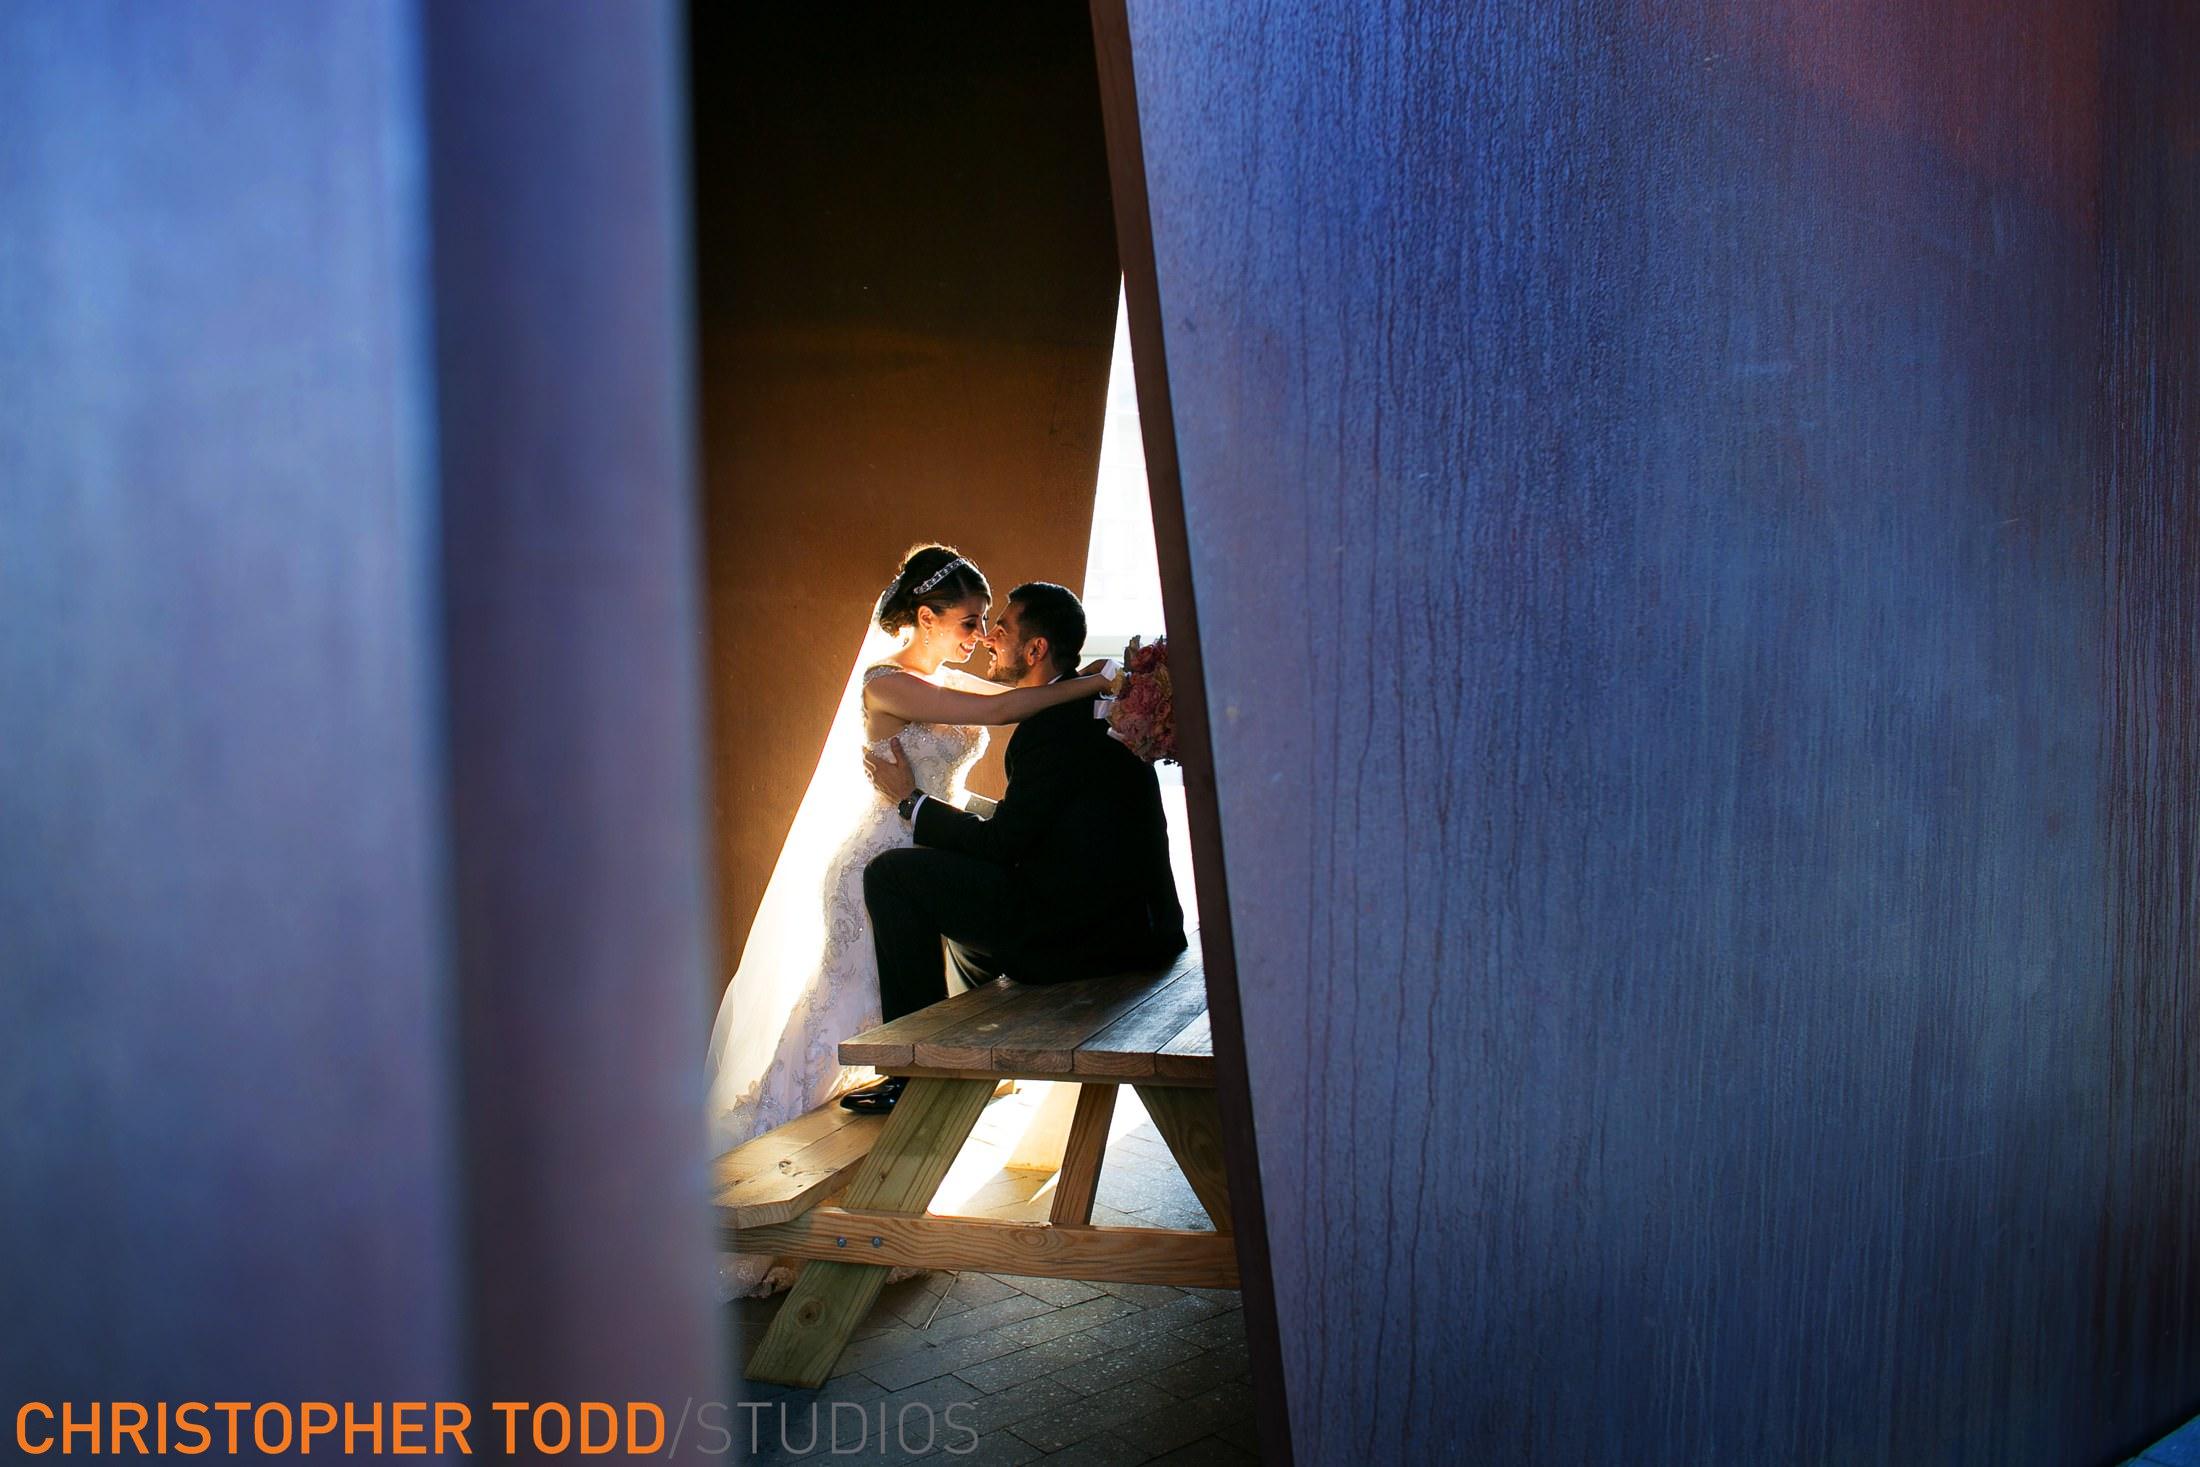 segerstrom-center-for-the-arts-orange-county-wedding-photographers